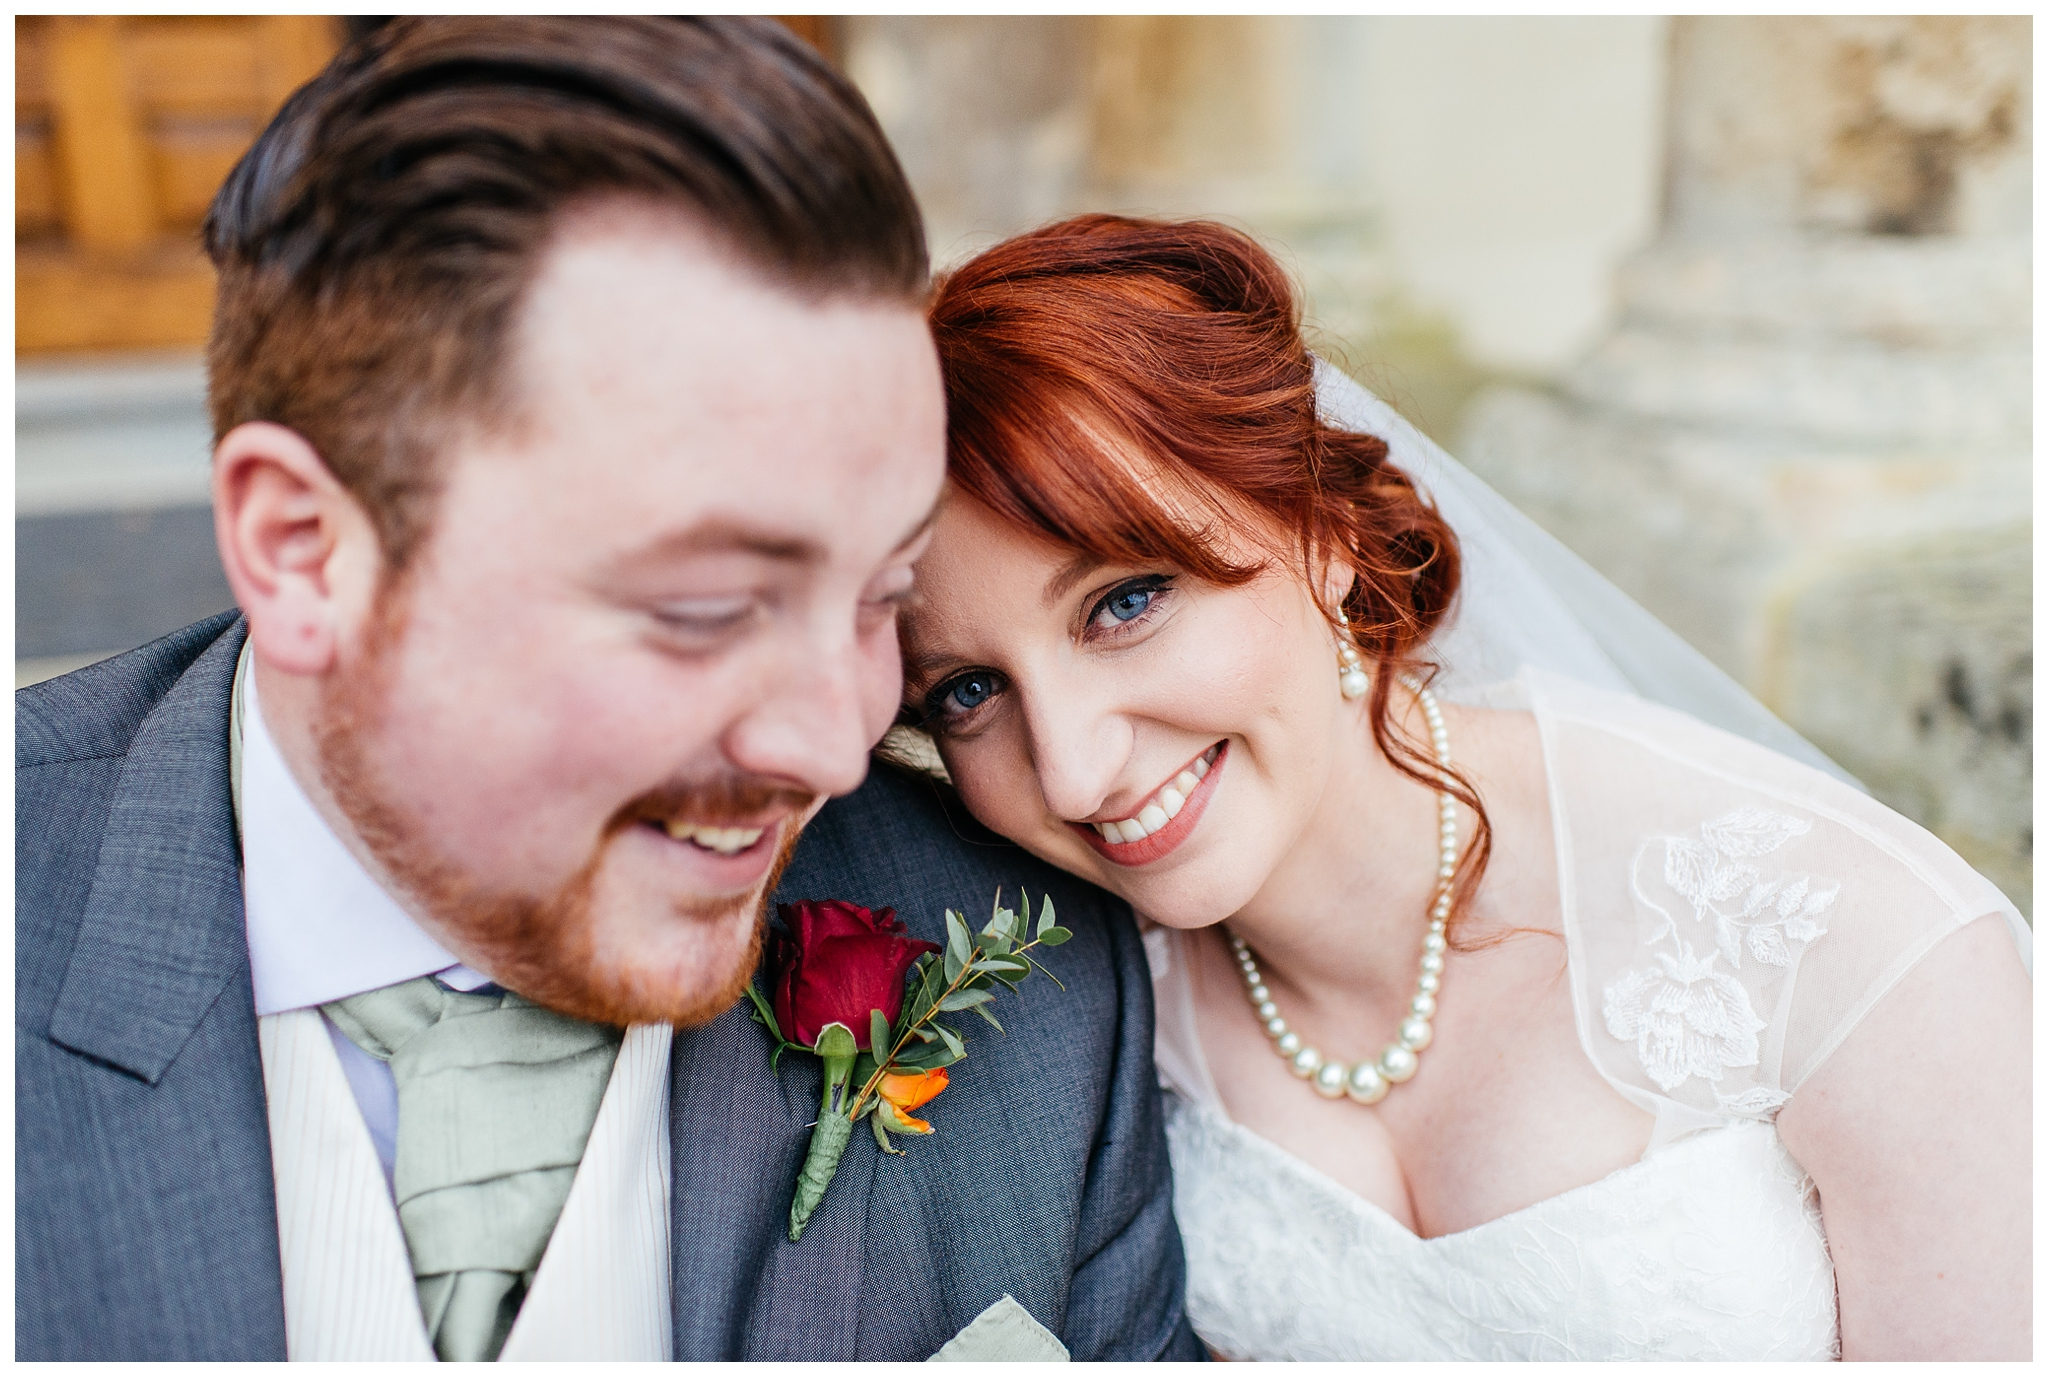 Emma&Paul-Elmore-Court-Winter-Wedding-Nikki-Cooper-Photography_0067.jpg